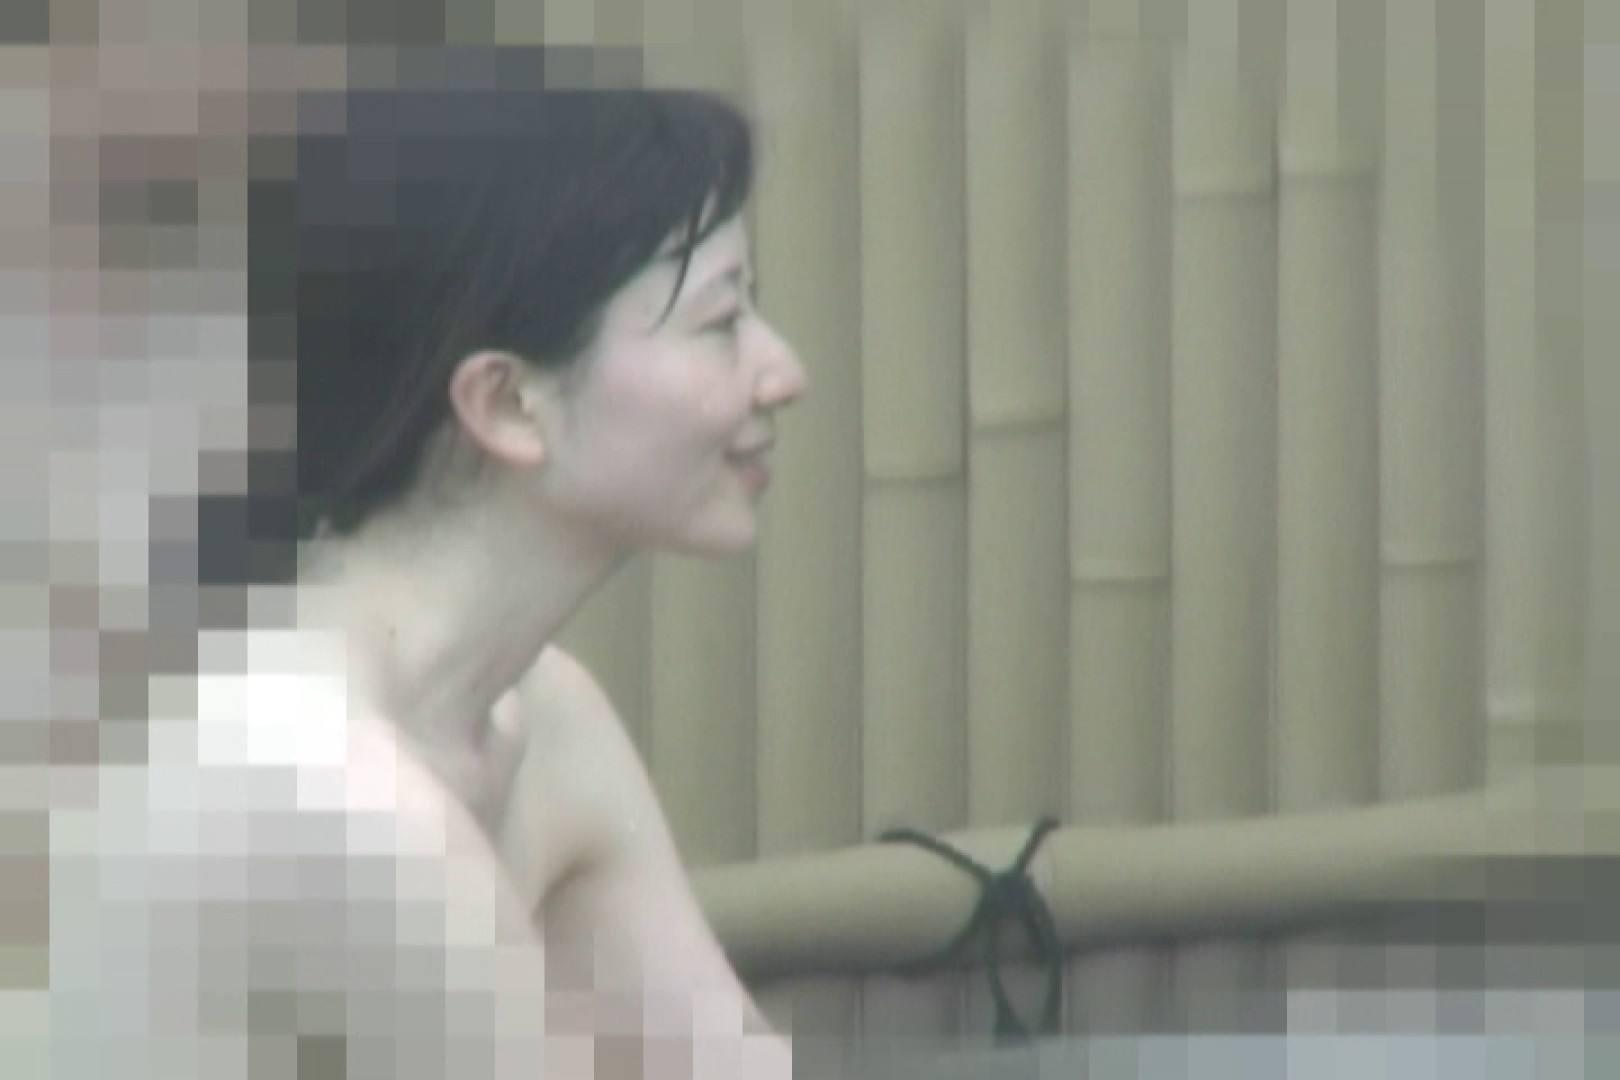 Aquaな露天風呂Vol.835 盗撮 | HなOL  73pic 59